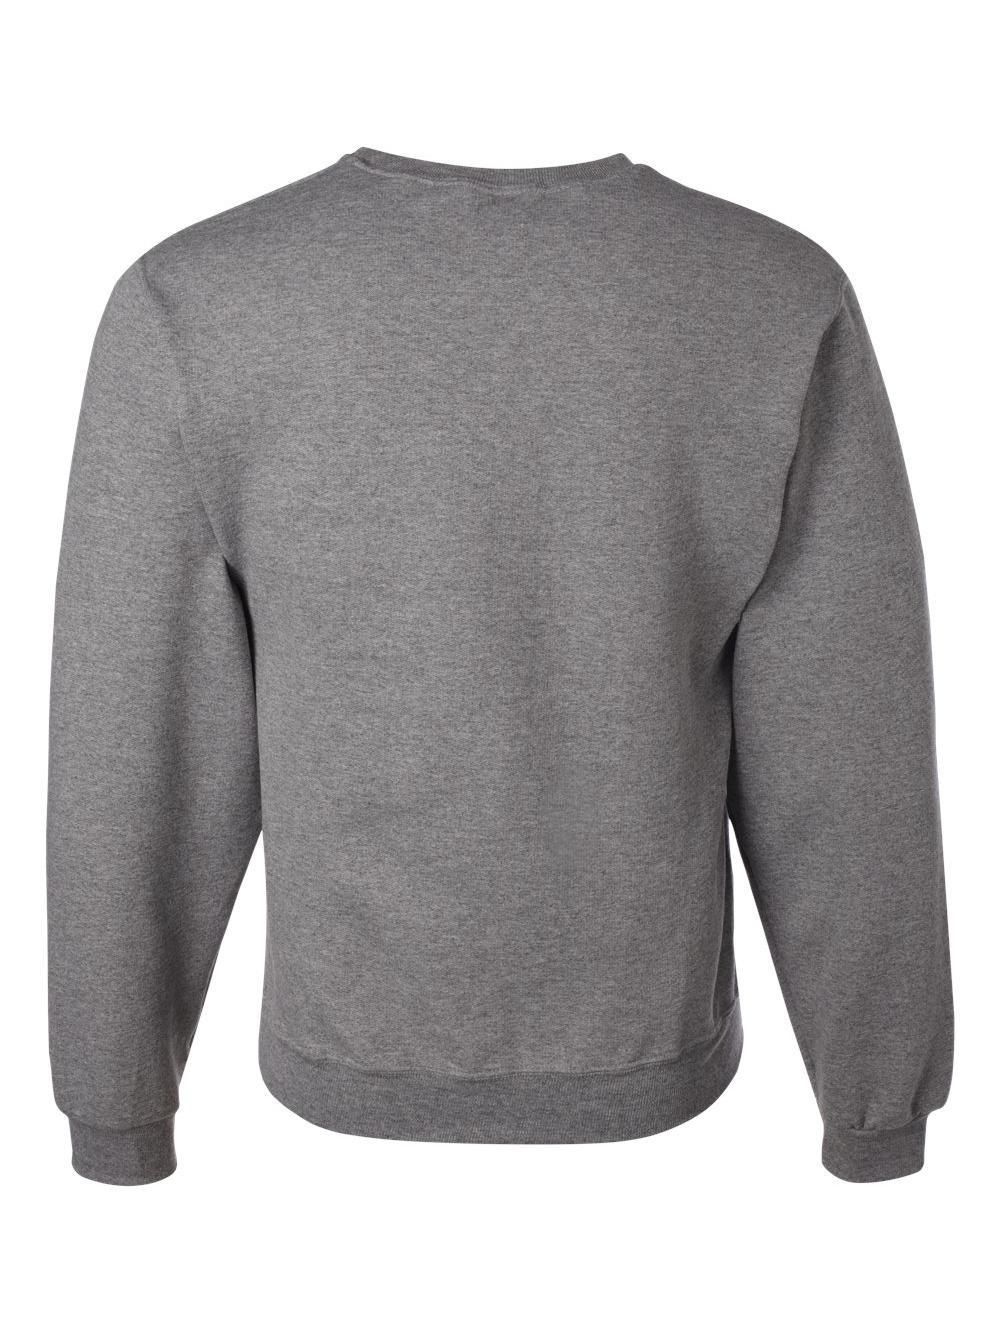 Jerzees-NuBlend-Crewneck-Sweatshirt-562MR thumbnail 70